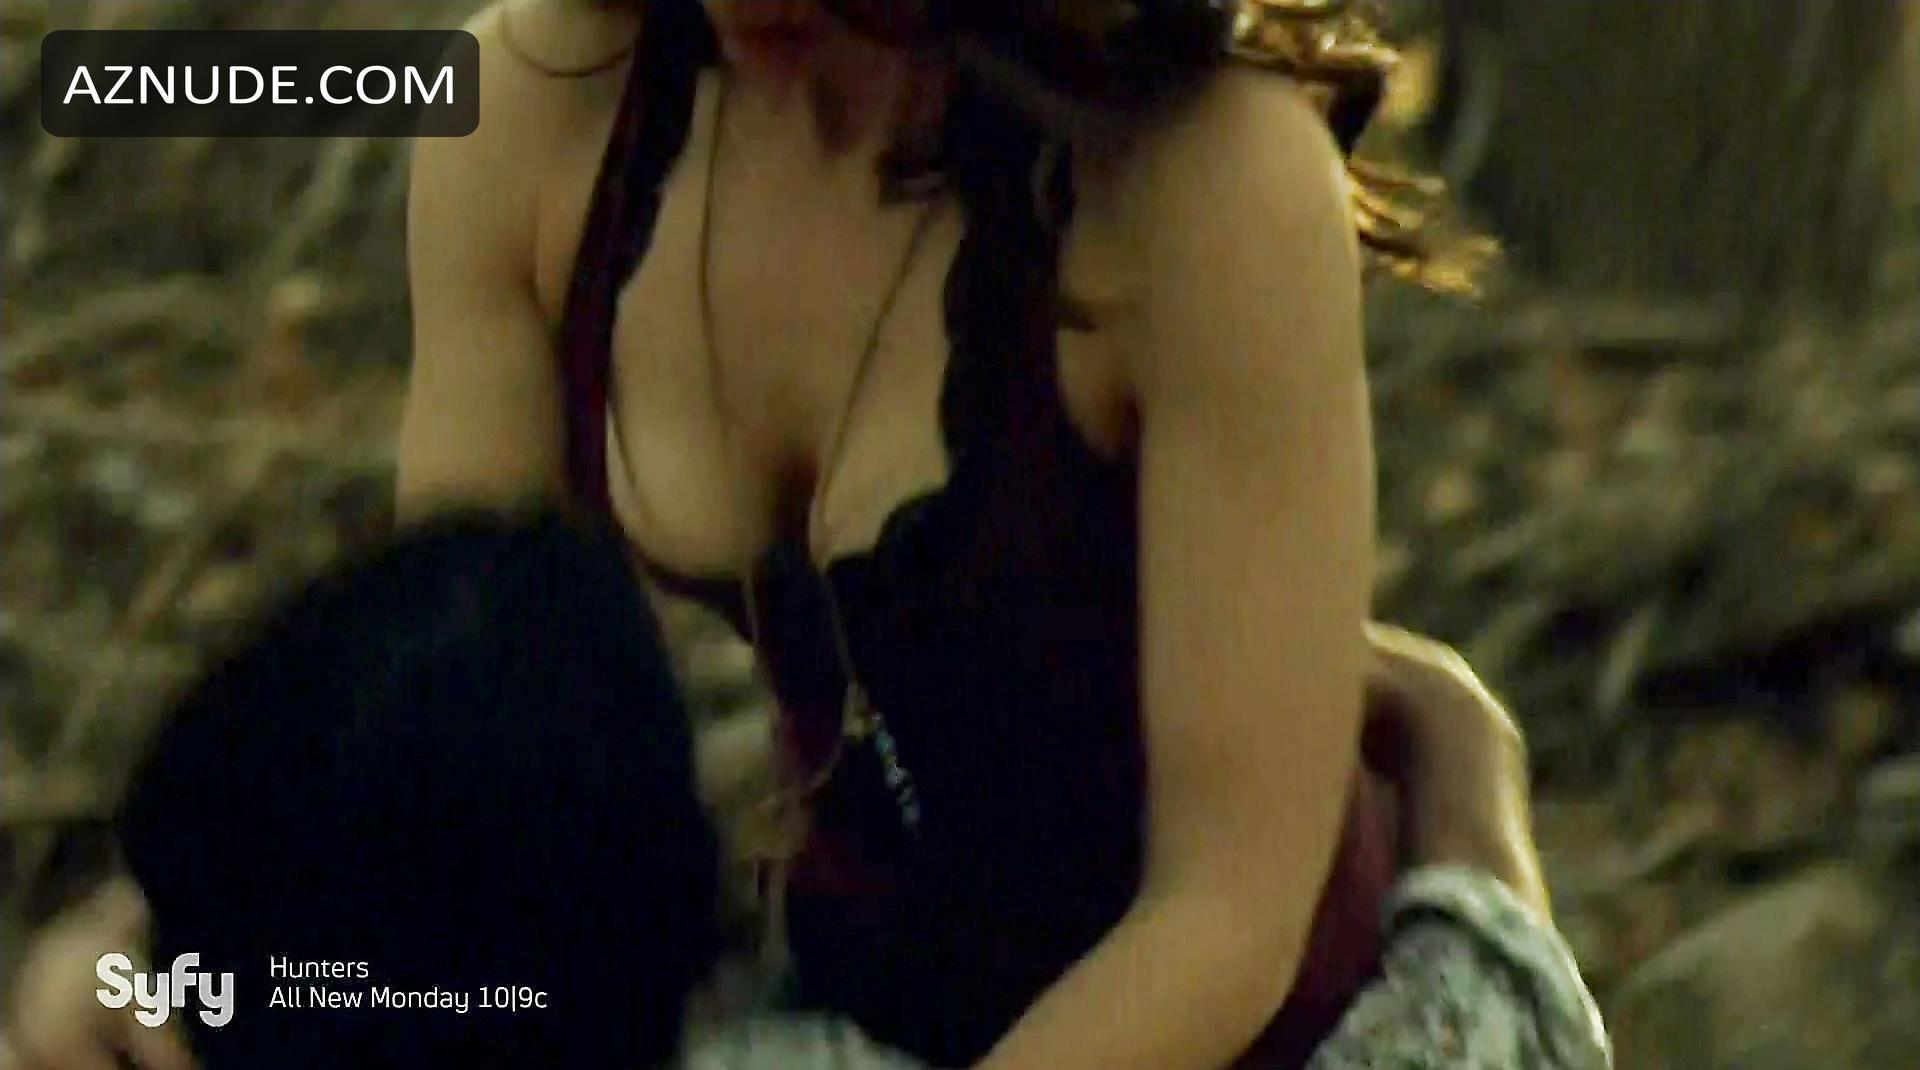 Scrofano nude melanie Melanie Scrofano